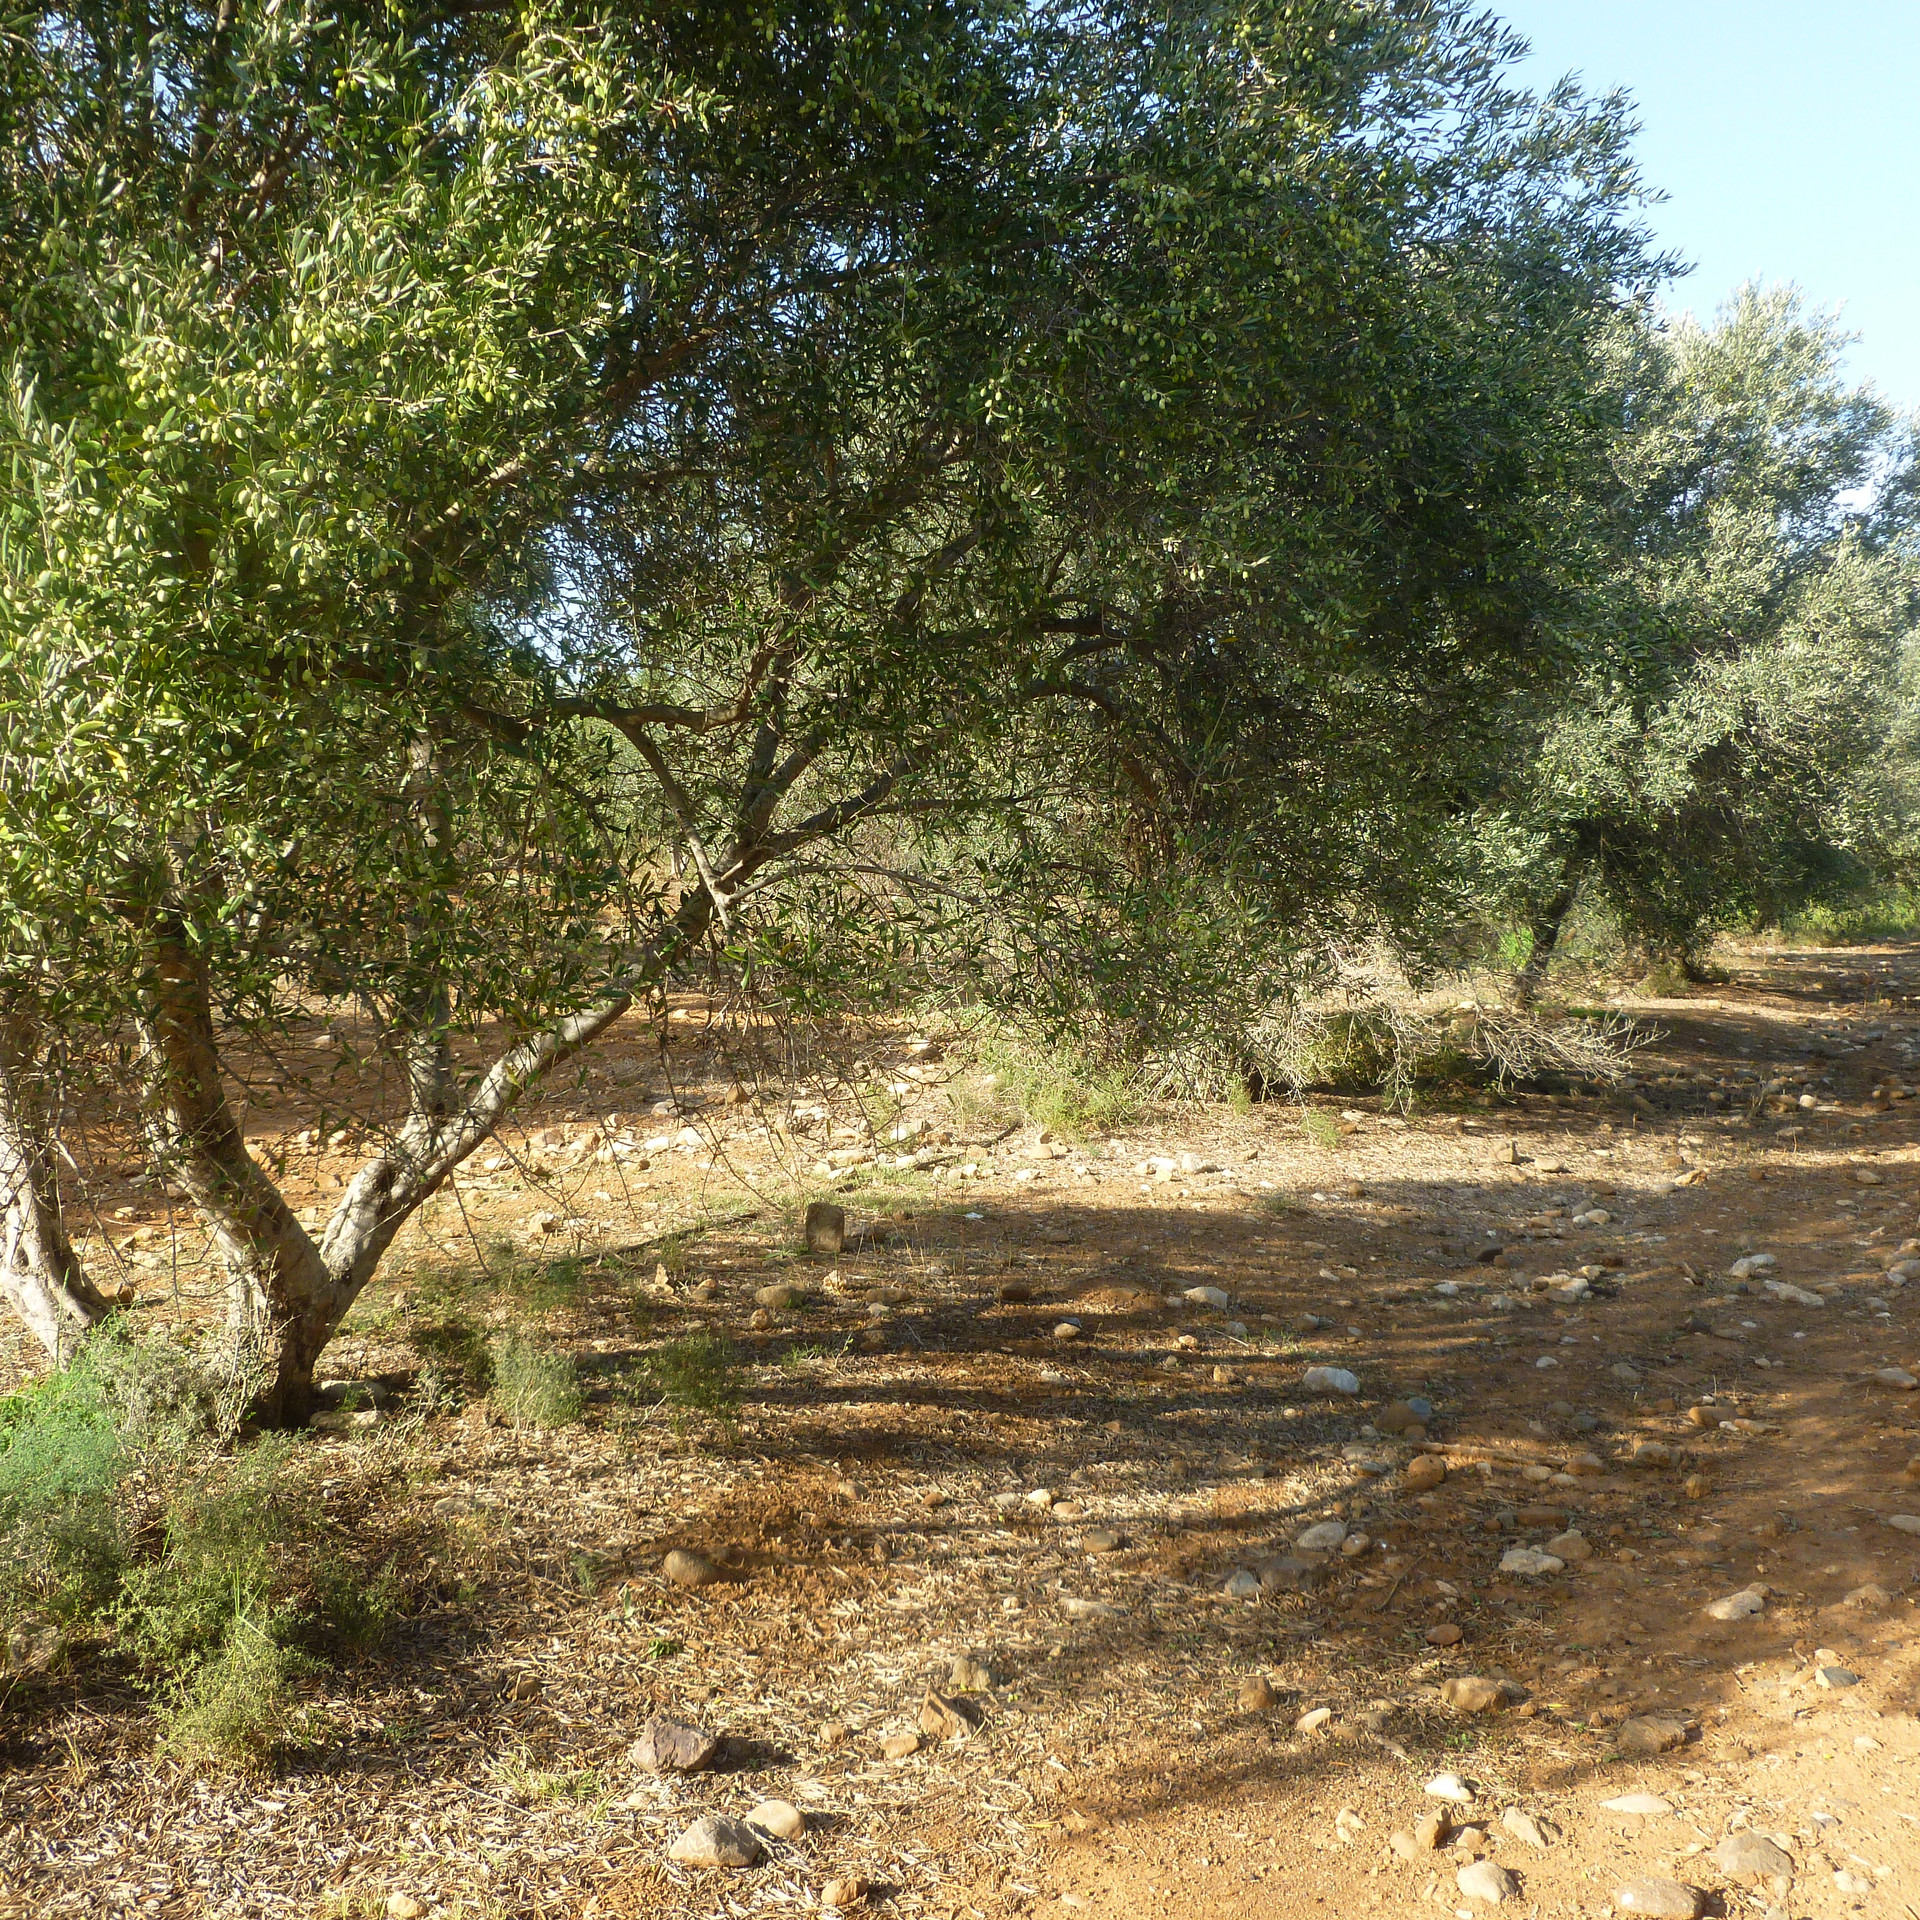 oliveraie_crète_tinafto